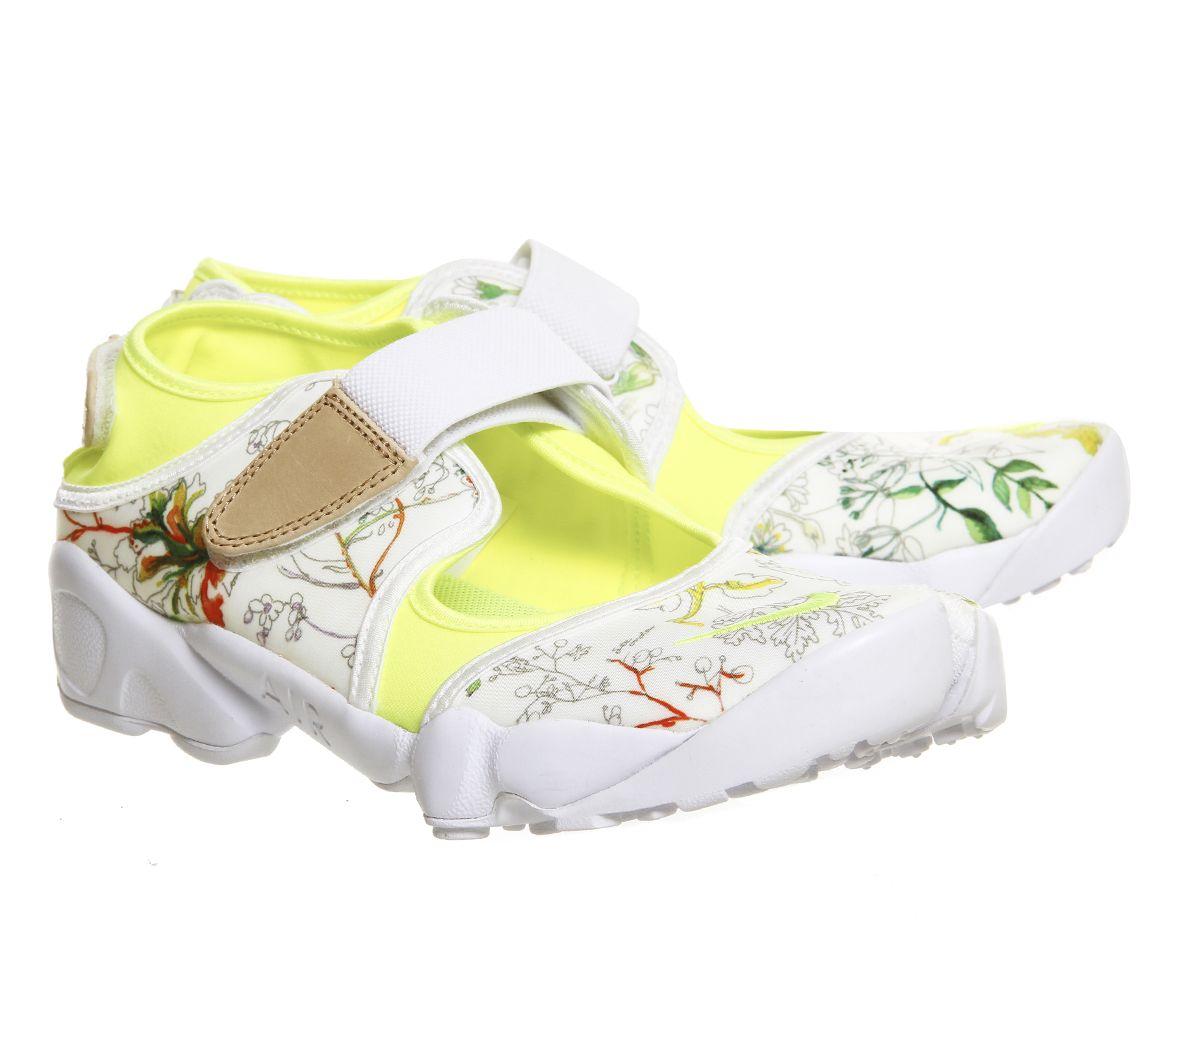 Outlet Women Nike Nike Air Rift Liberty White Vachetta Tan Qs Unisex Sports